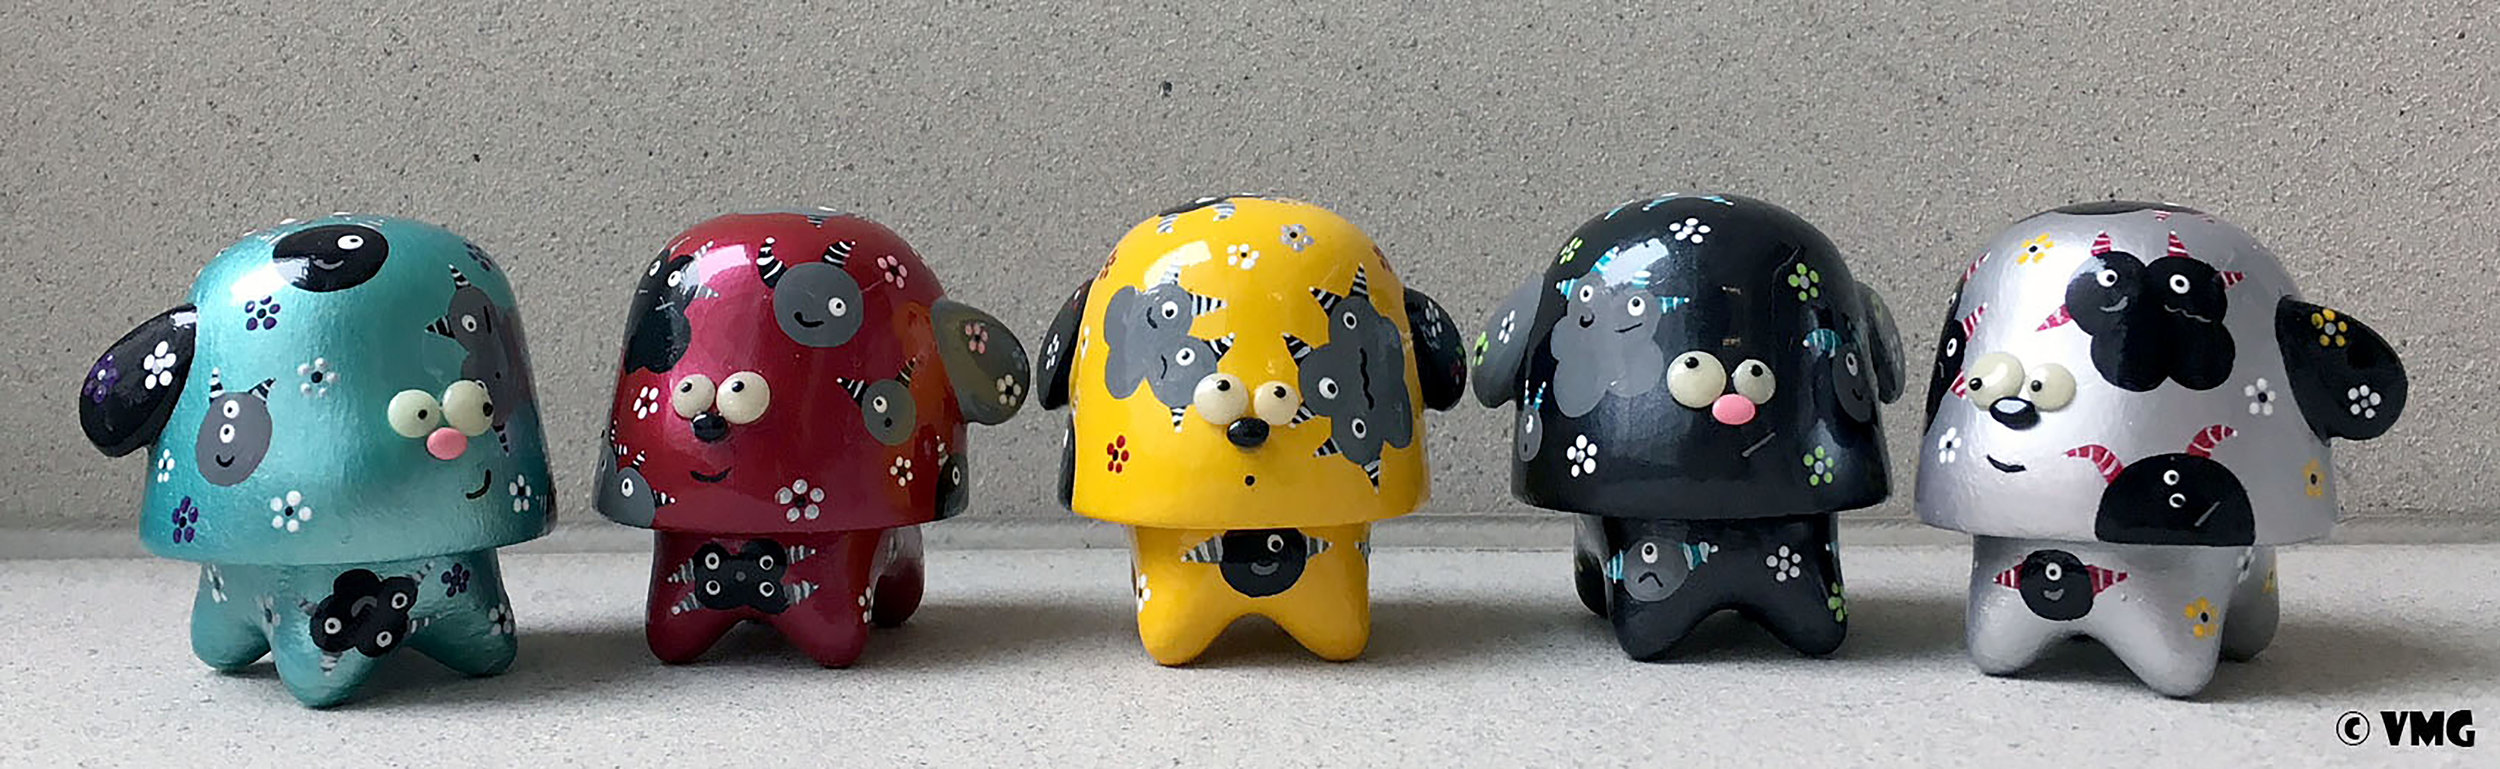 Doggos of the Five Elements-VMG - Valerie Gudell.jpg